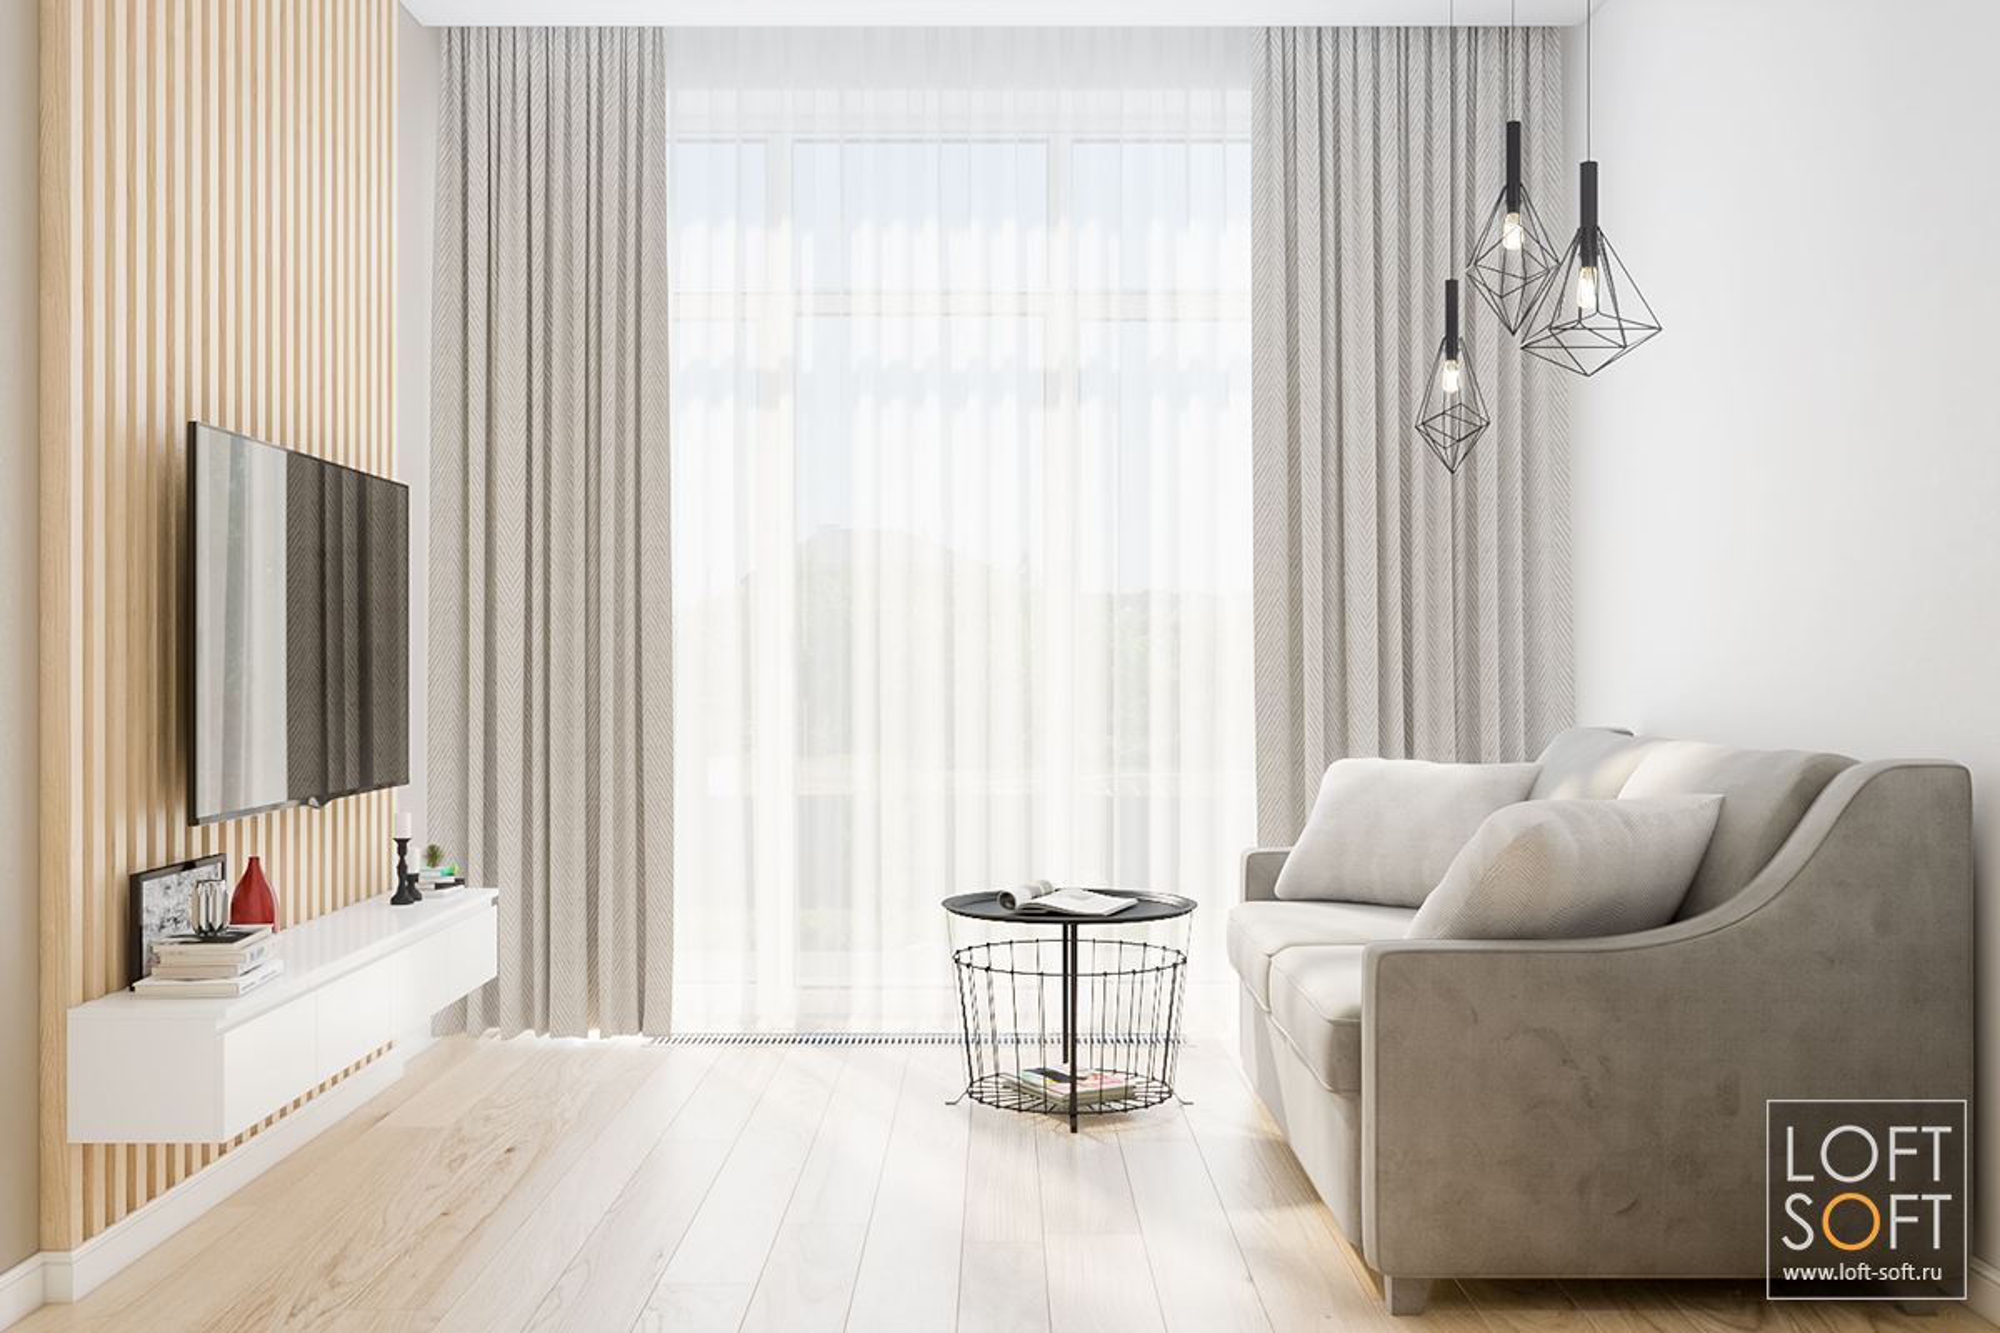 интерьер небольшой комнаты, современный минимализм винтерьере